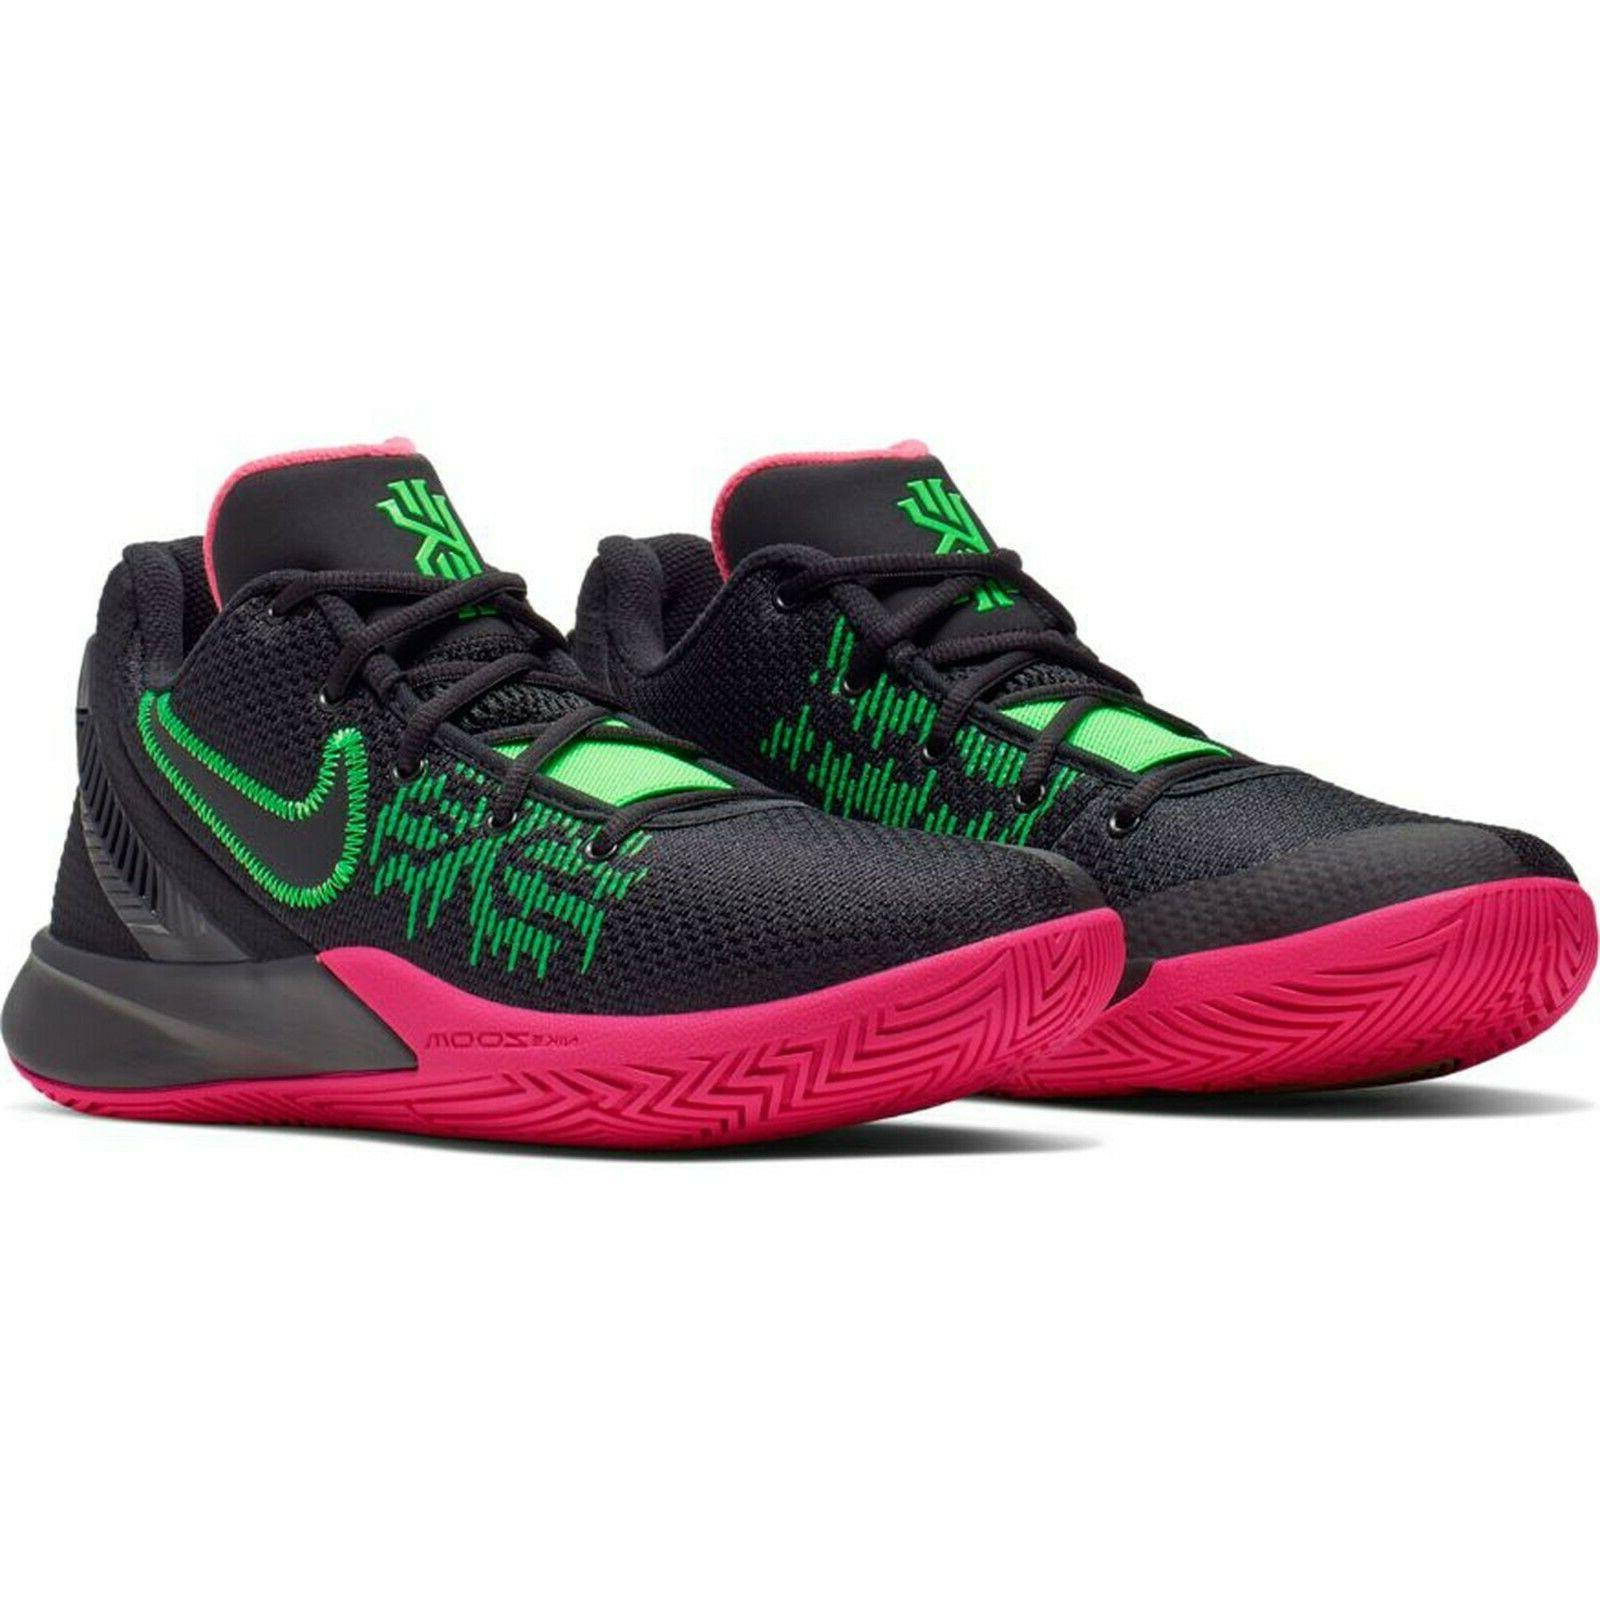 Nike Kyrie Flytrap II 2 Basketball Shoes  NEW W/ BOX